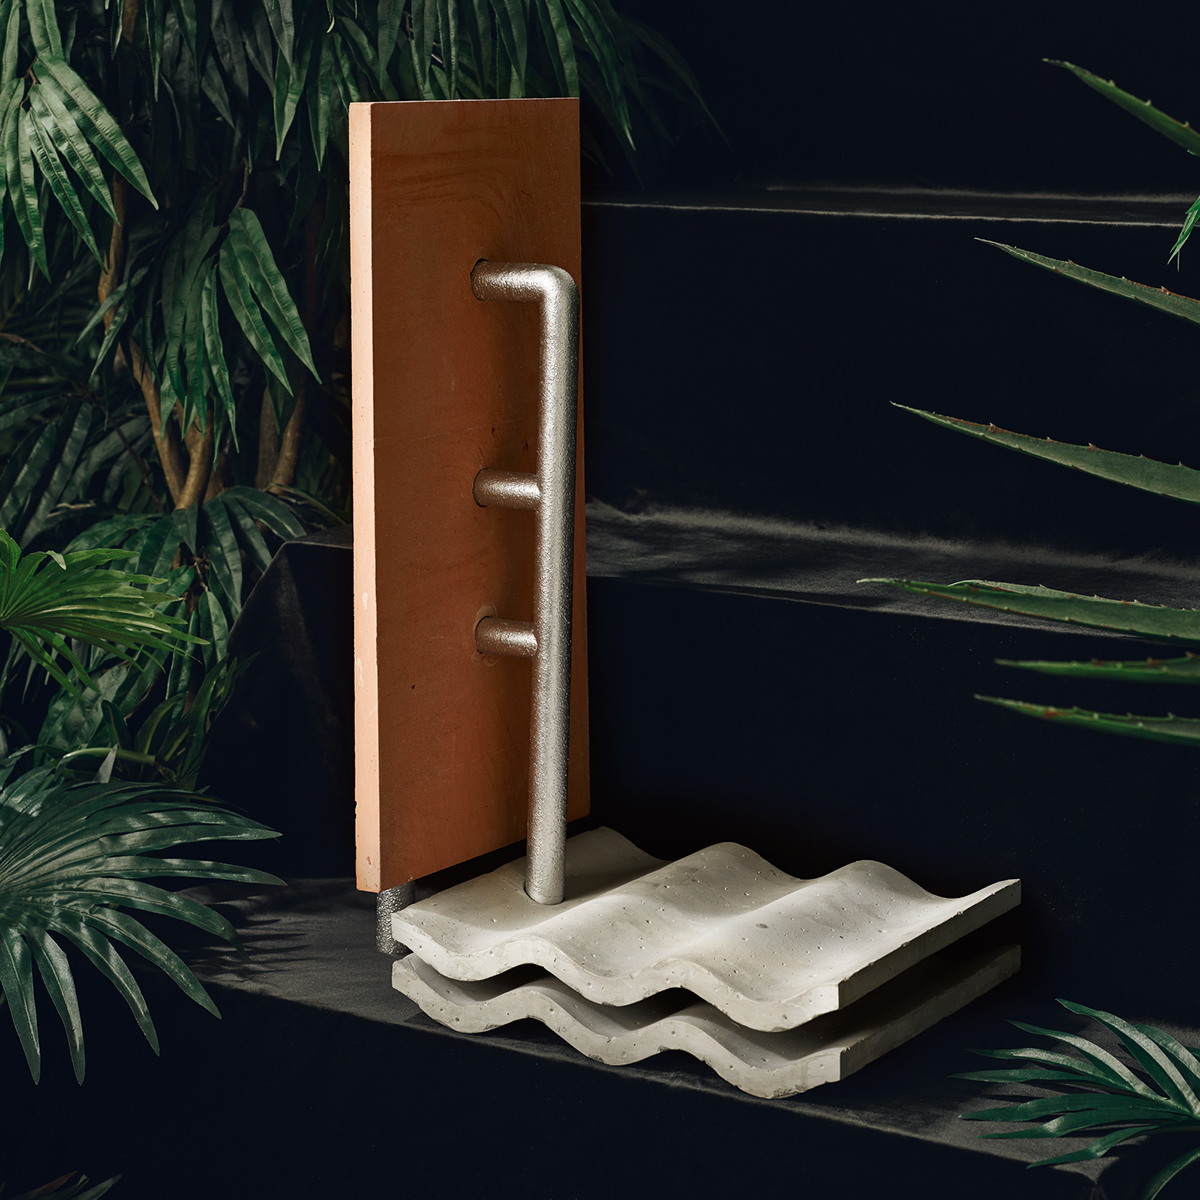 Valaire - Set Design Case Study